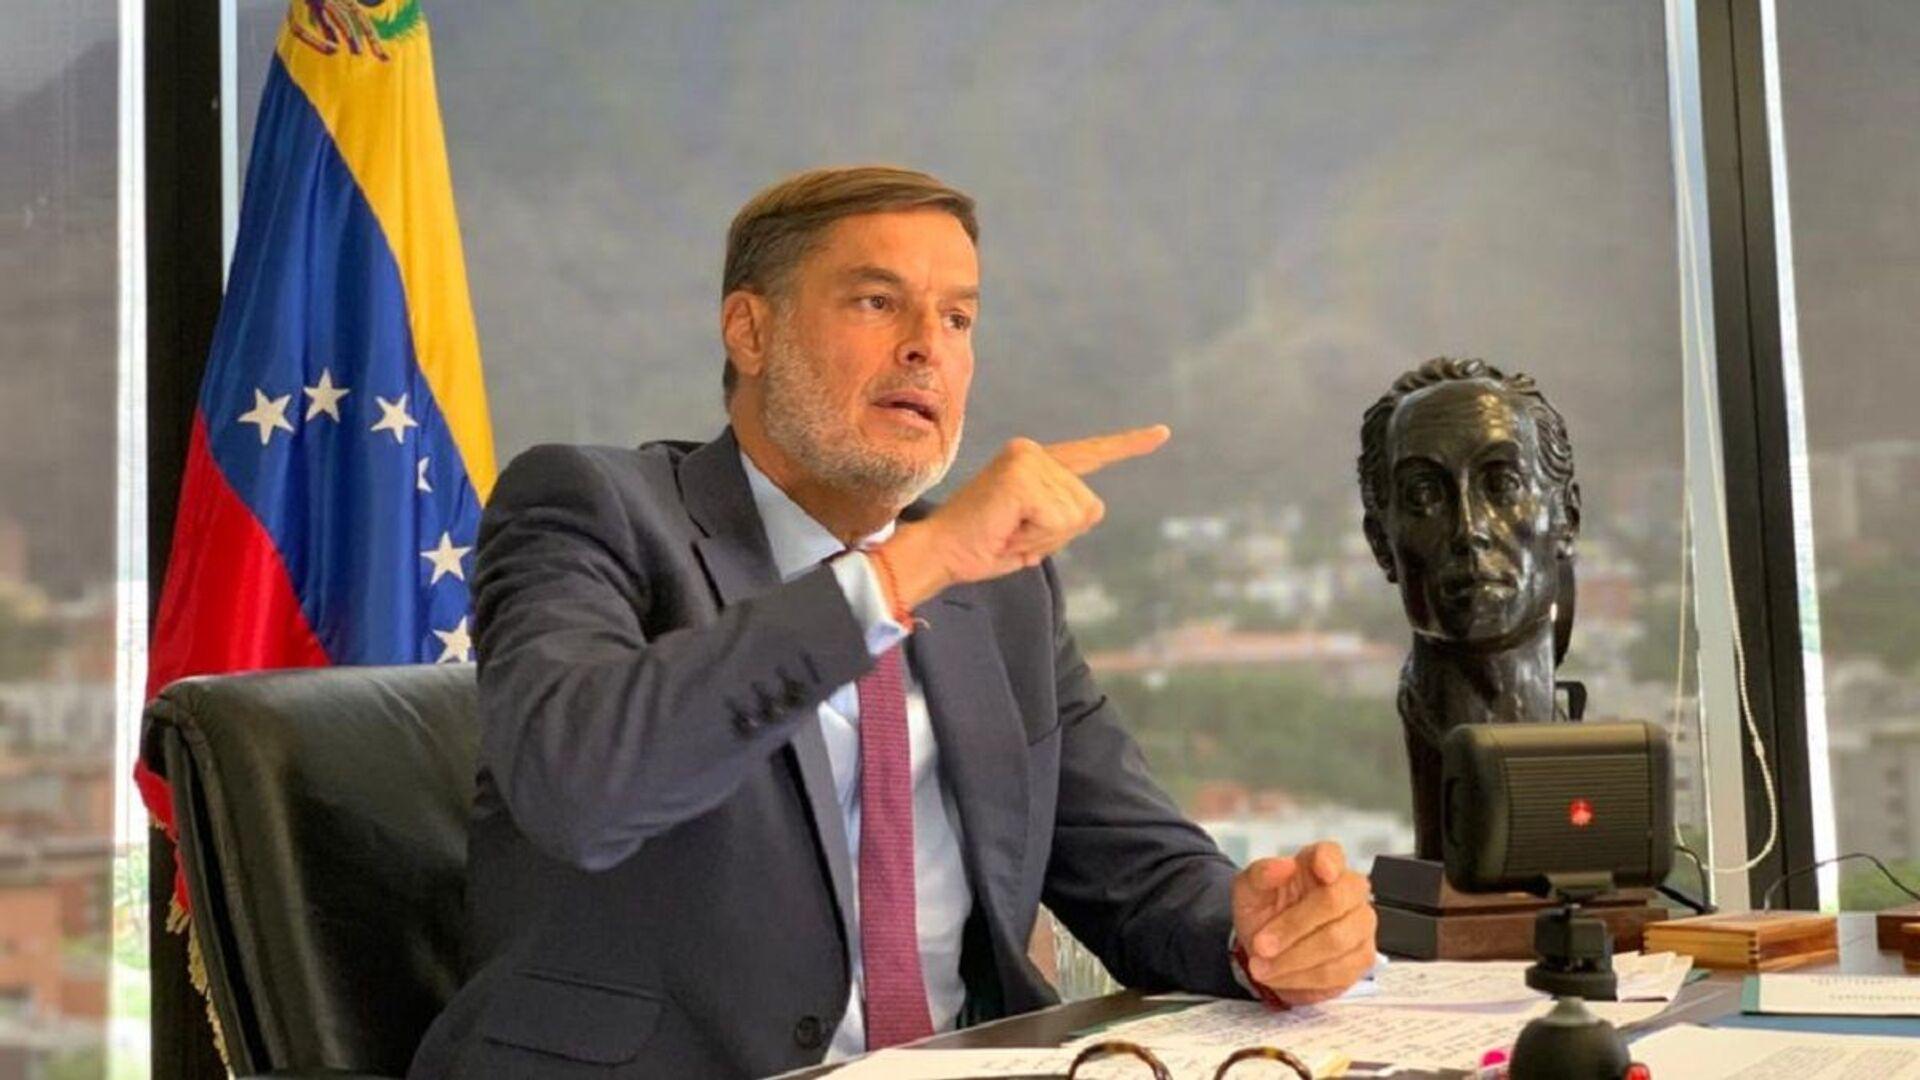 Félix Plasencia, el canciller de Venezuela - Sputnik Mundo, 1920, 13.09.2021